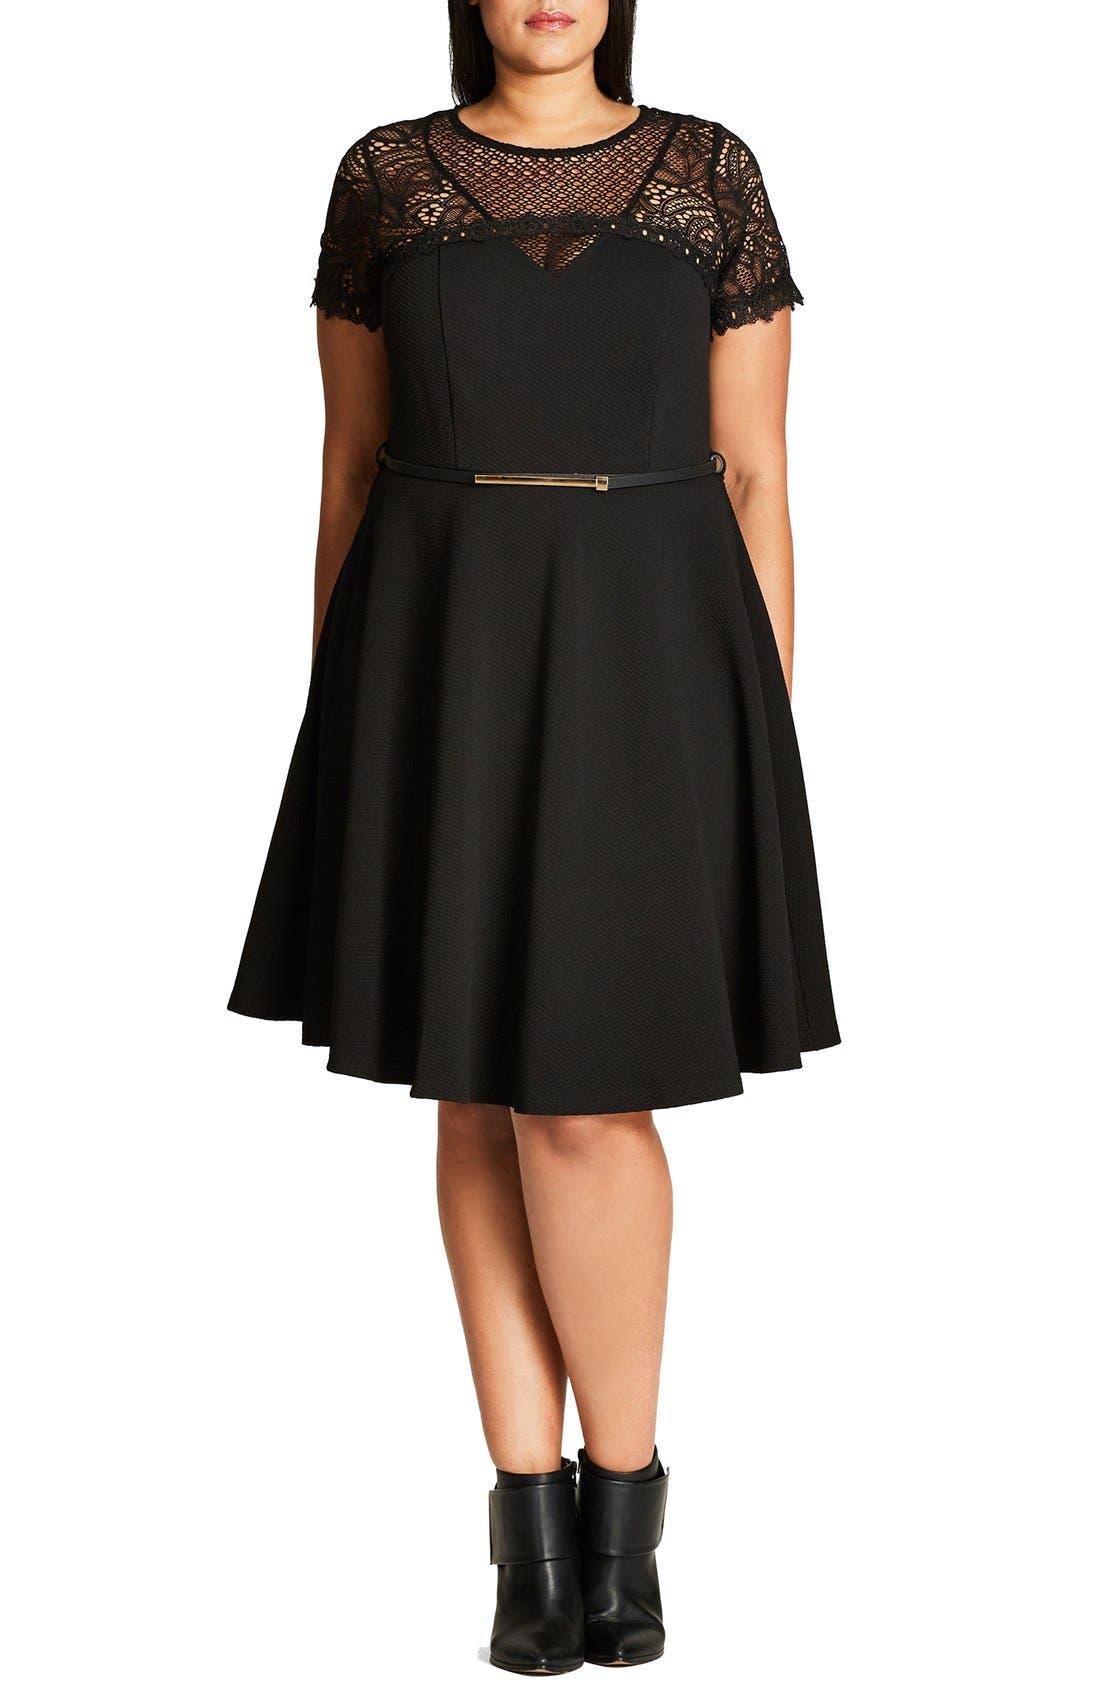 CITY CHIC Lace Fever Dress, Main, color, 001